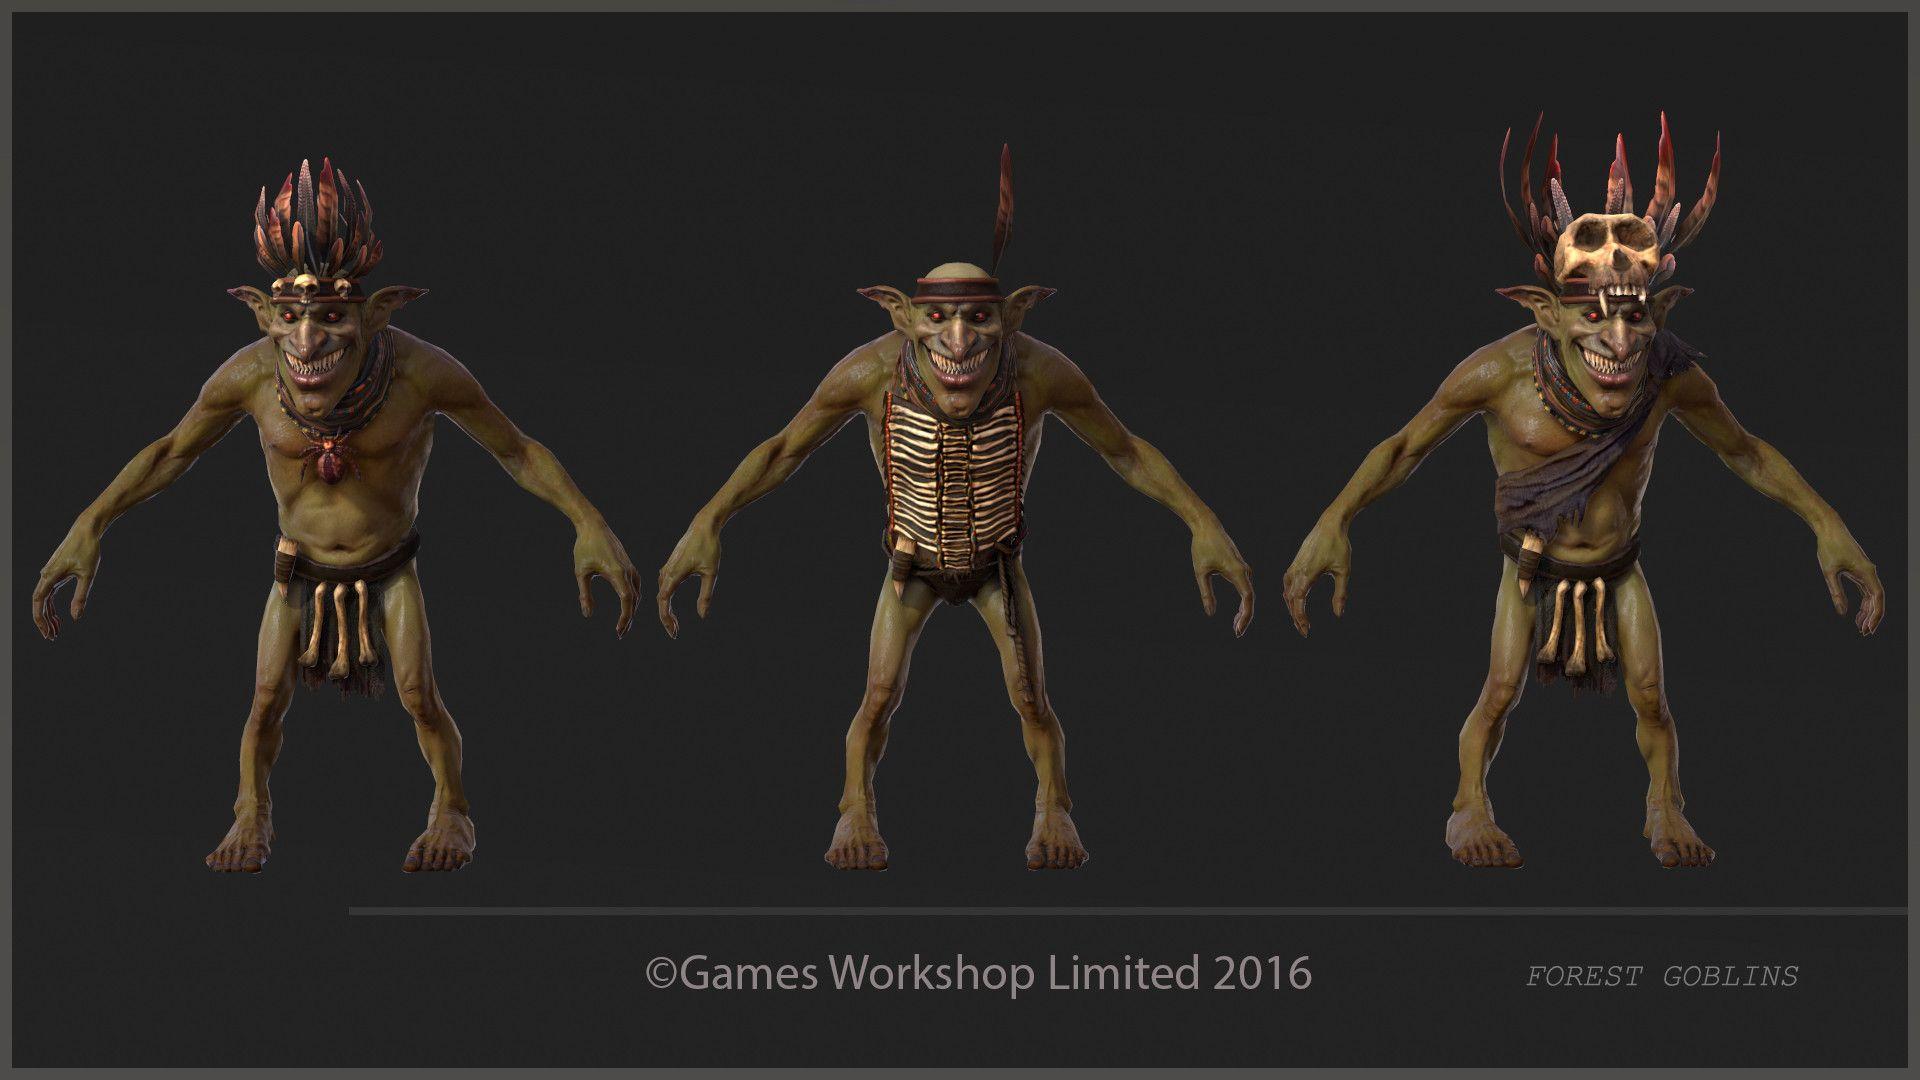 ArtStation - Total War Warhammer Forest Goblins, Palomita A Punto Efe